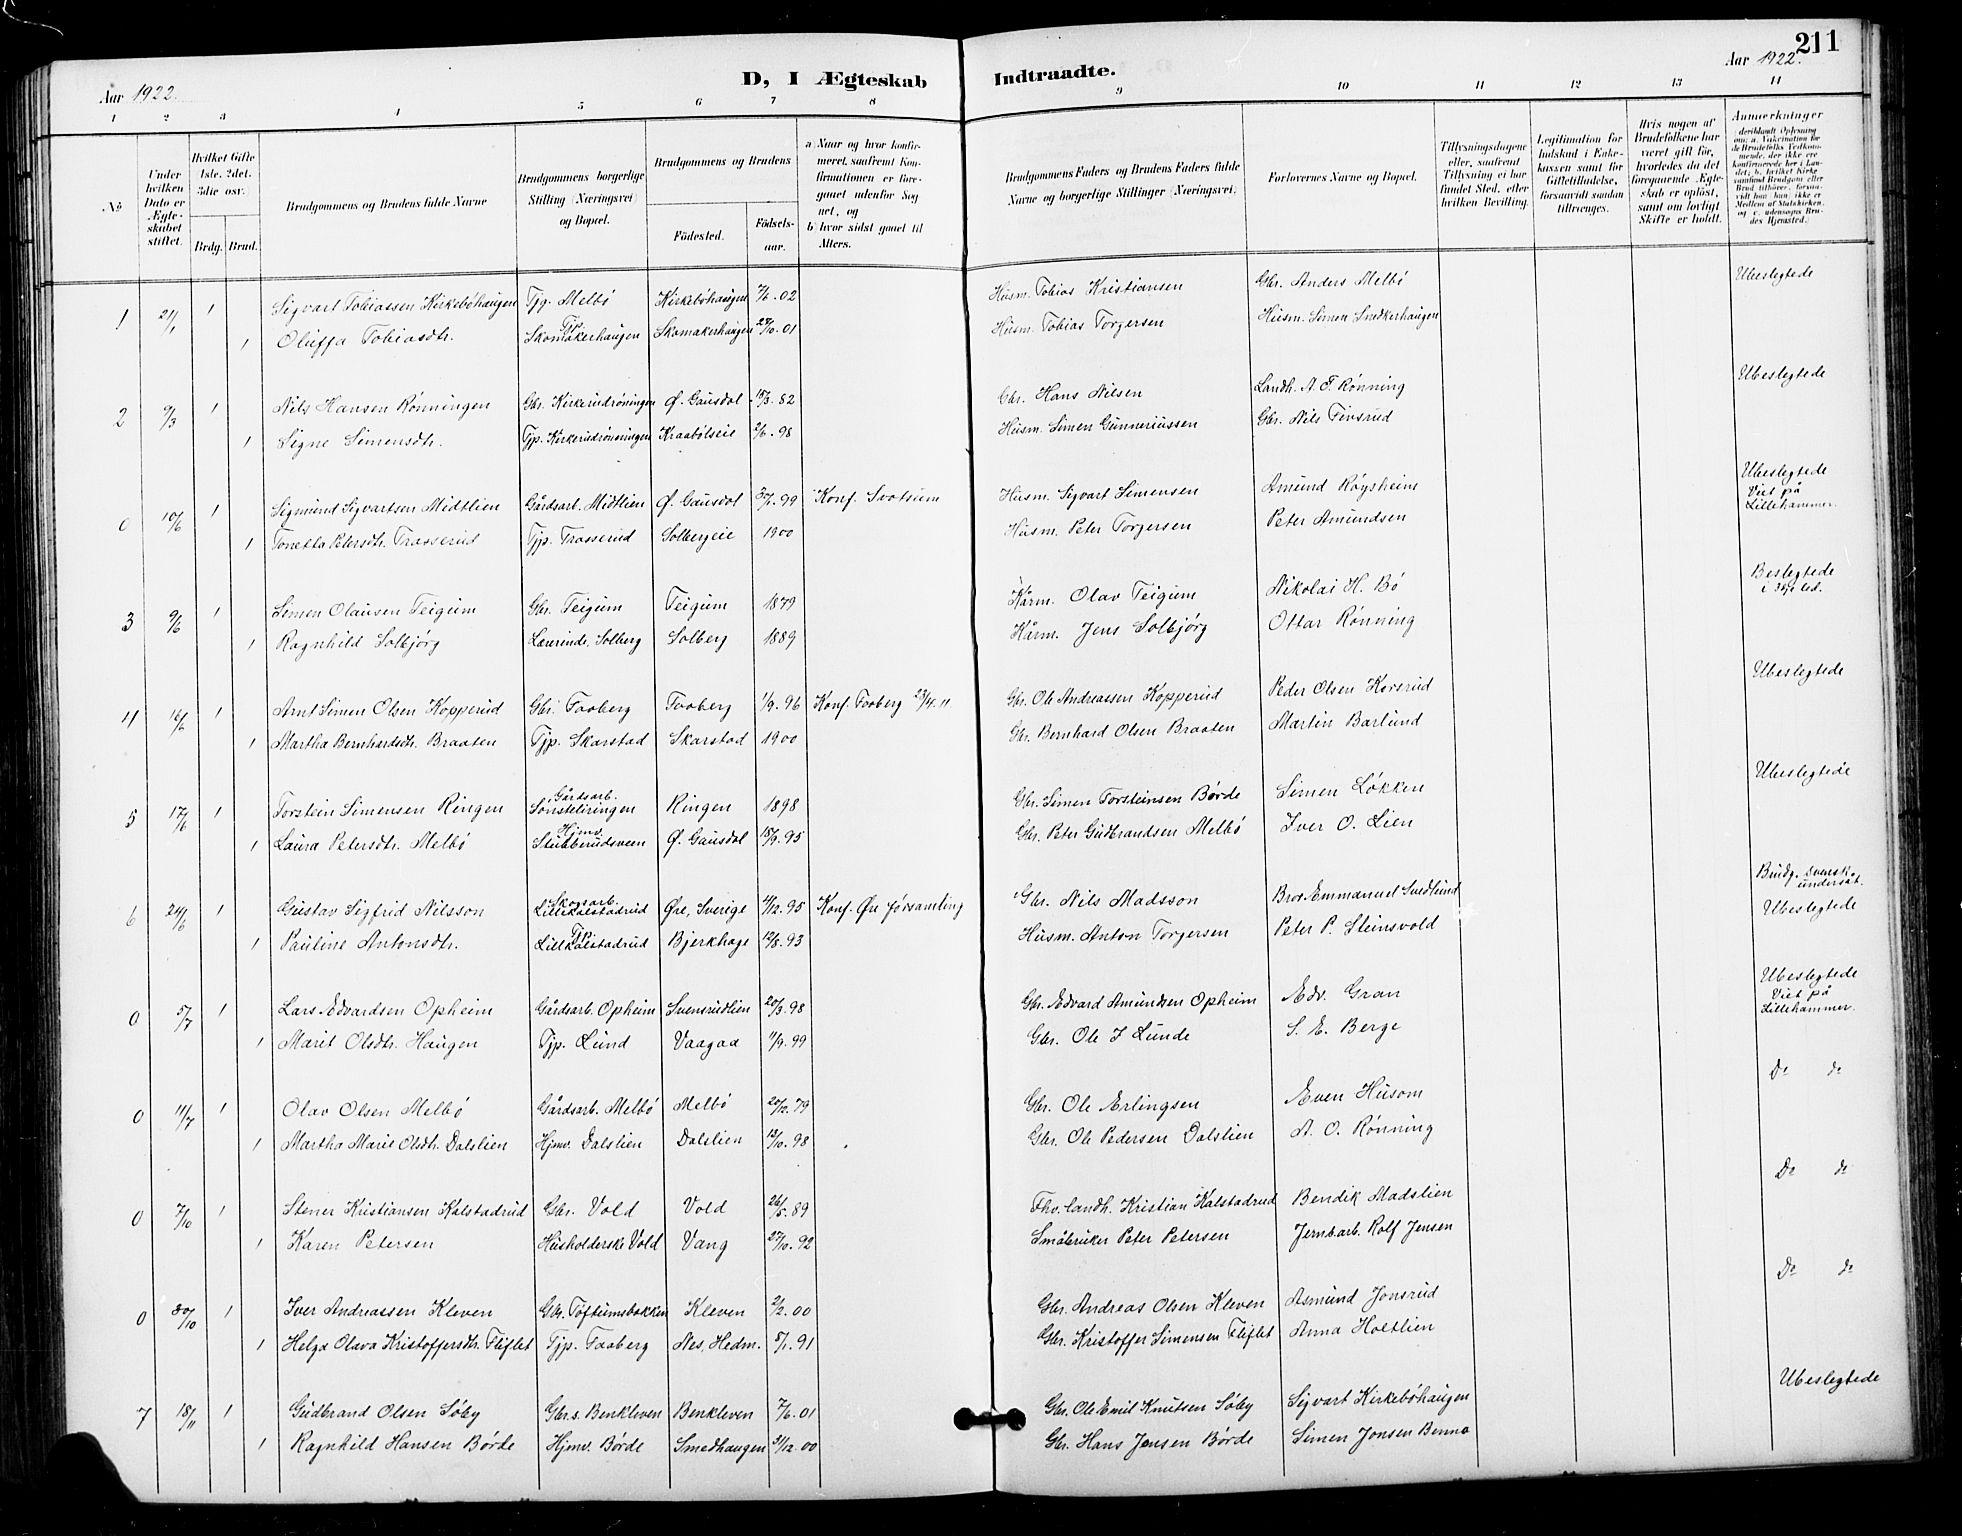 SAH, Vestre Gausdal prestekontor, Klokkerbok nr. 3, 1896-1925, s. 211